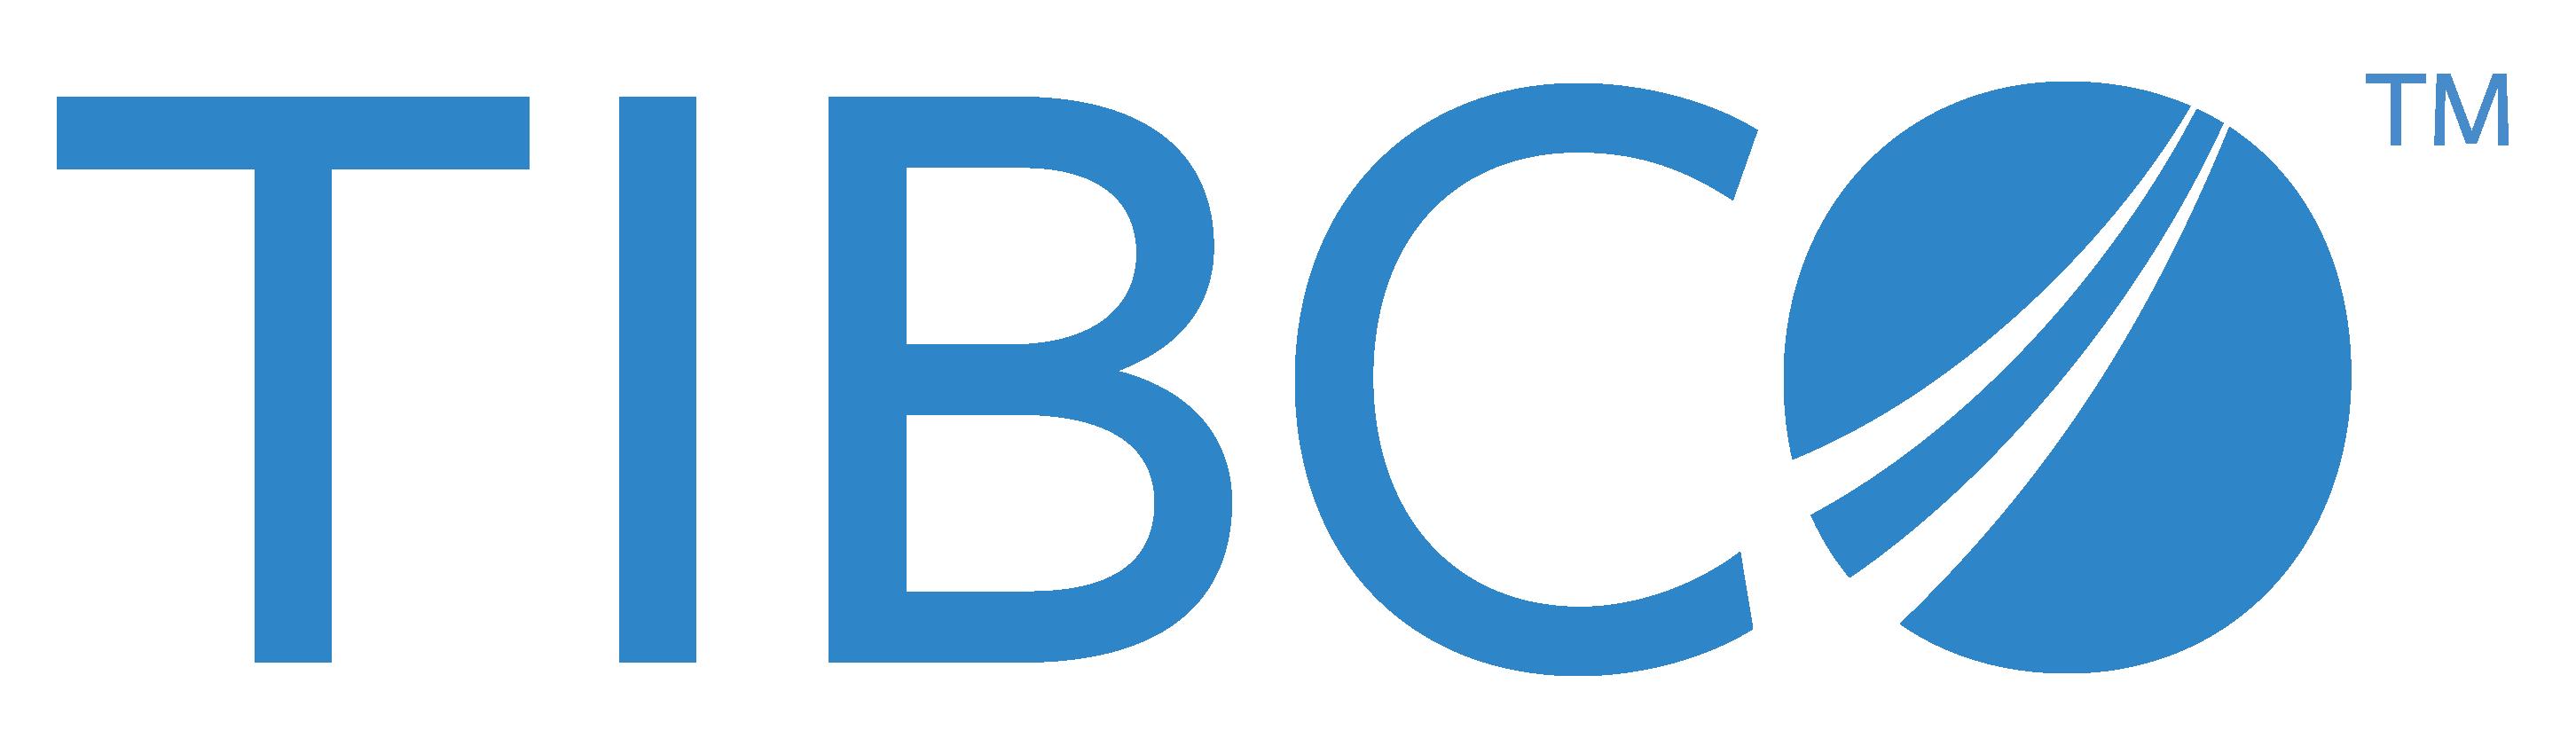 Tibco_logo-_Palo_Alto_CA_company-_PNG_2013-11-24_16-00.png